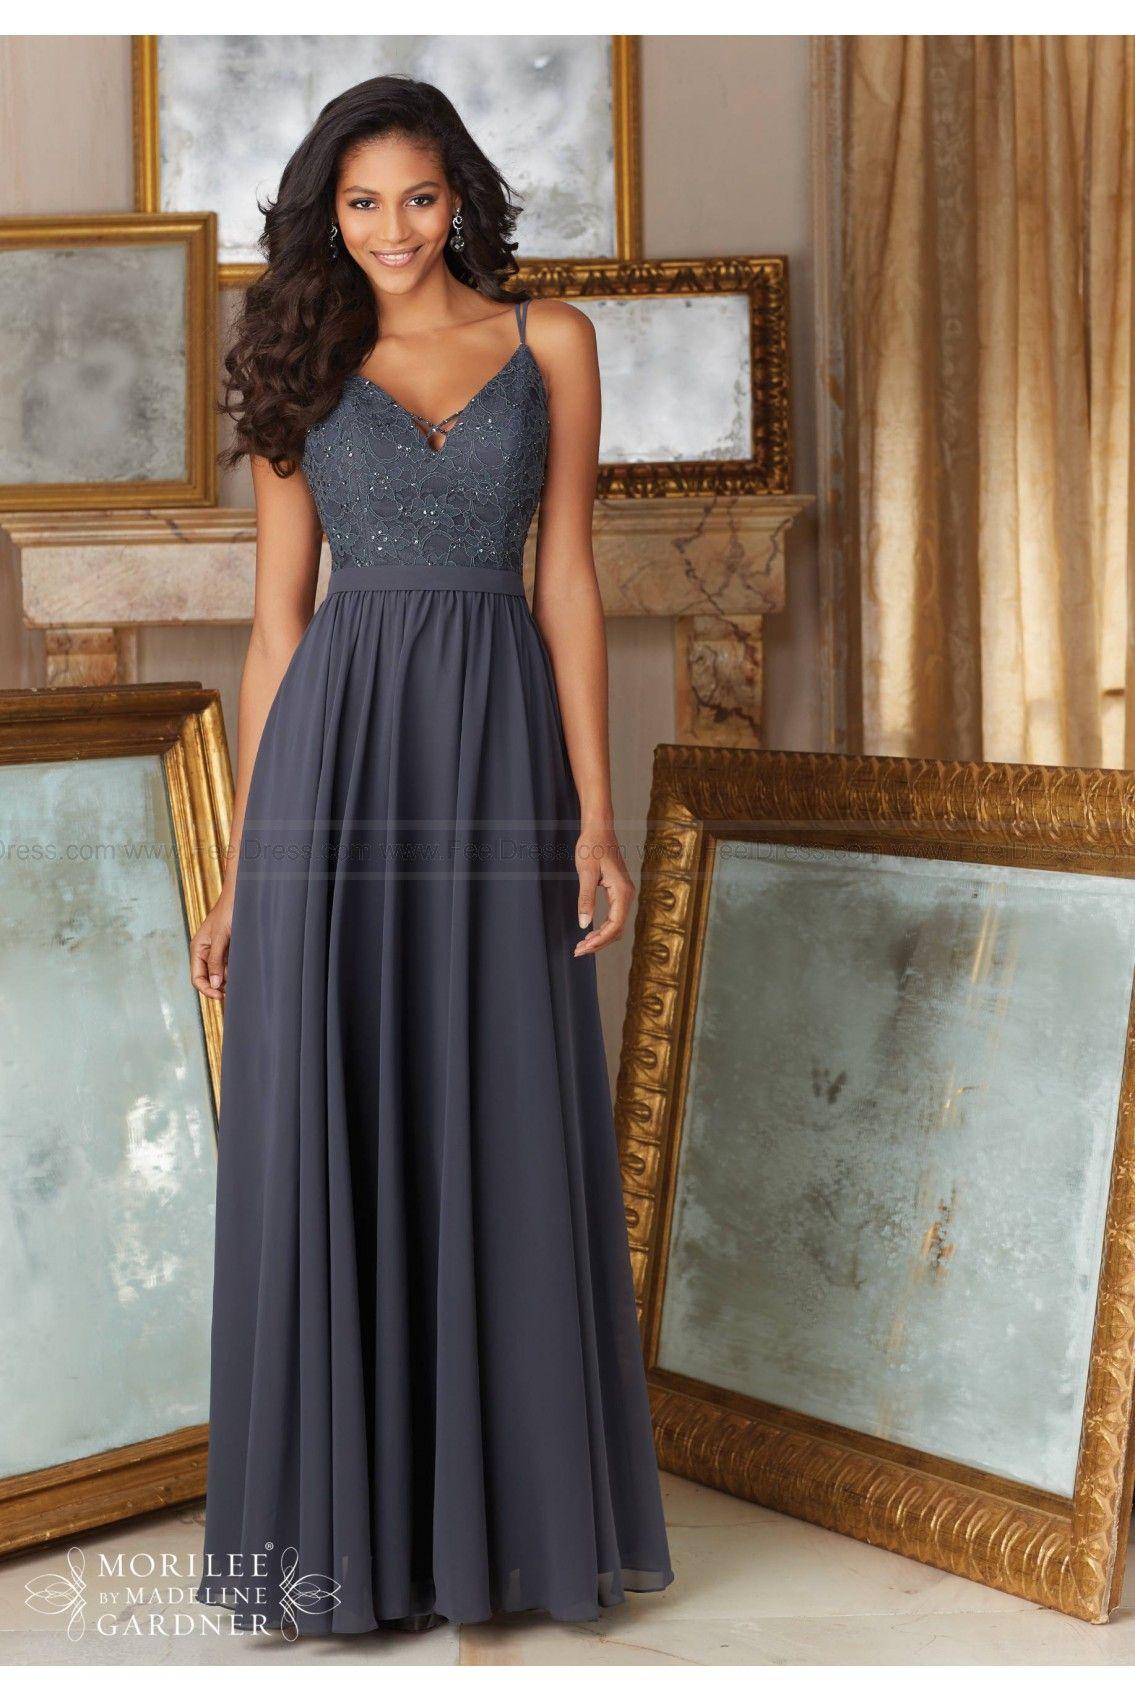 Mori Lee Bridesmaids Dress Style 146 | Mori Lee | Pinterest